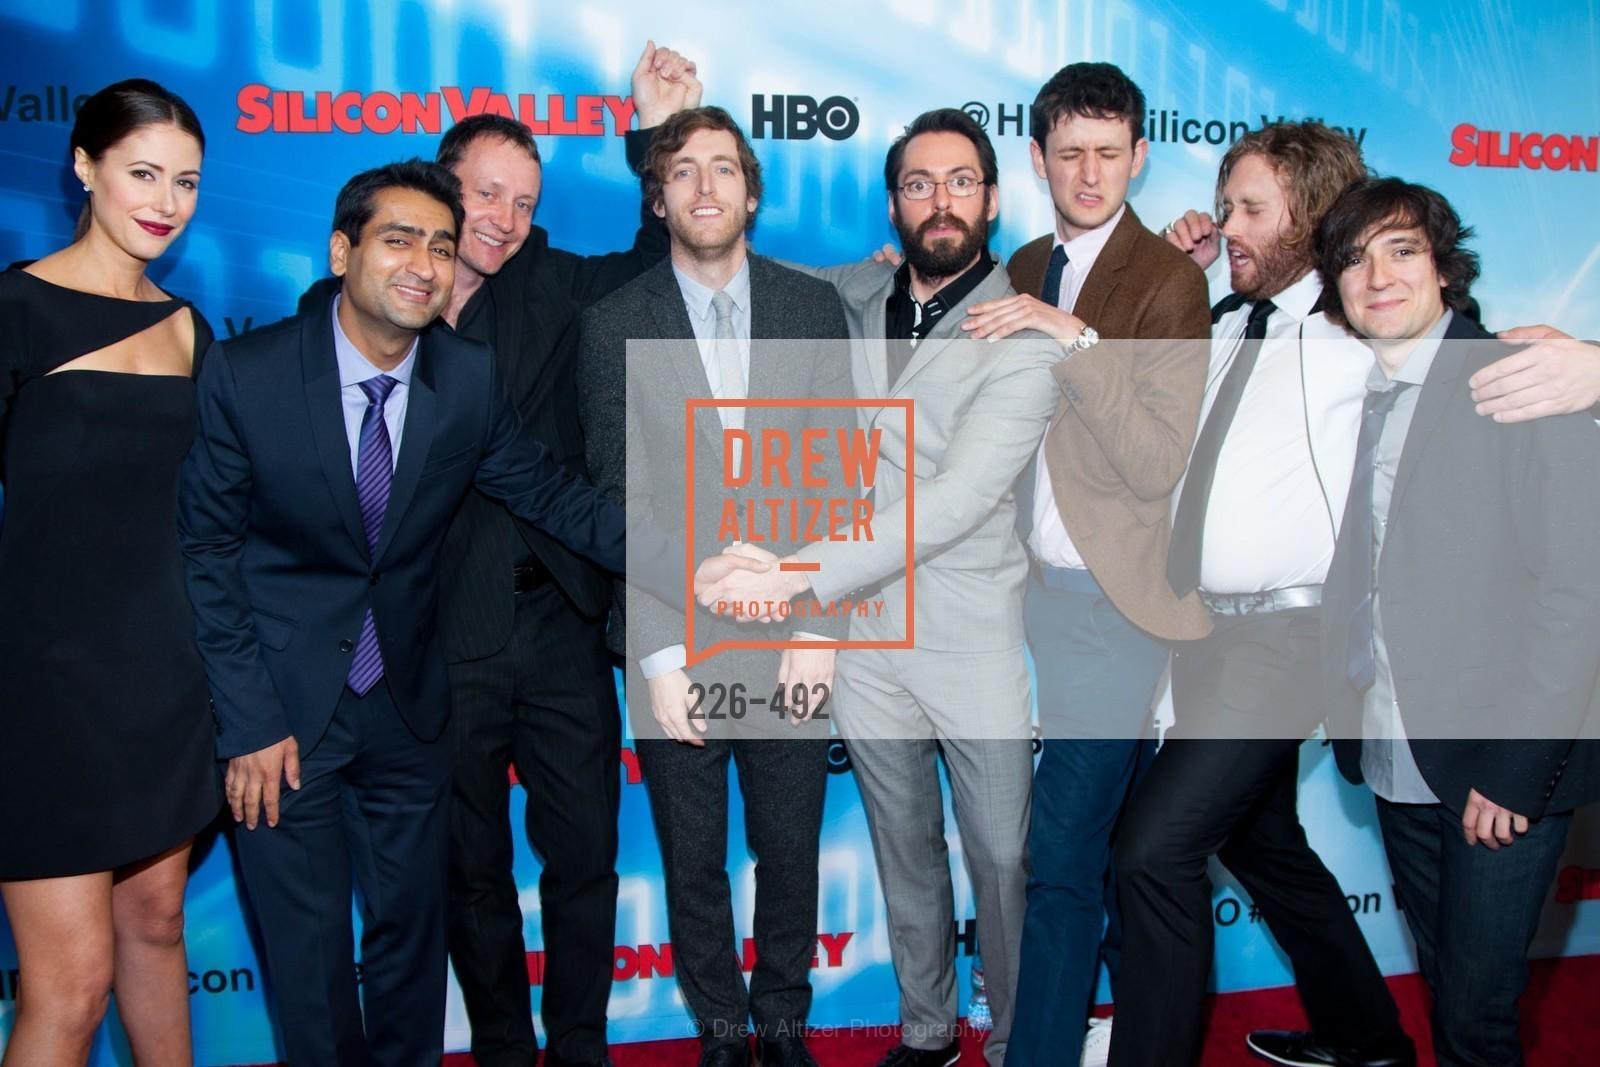 Amanda Crew, Kumail Nanjiani, Alec Berg, Thomas Middleditch, Martin Starr, Zach Woods, TJ Miller, Josh Brener, HBO Original Series 'Silicon Valley' Bay Area Premiere, US. US, April 2nd, 2014